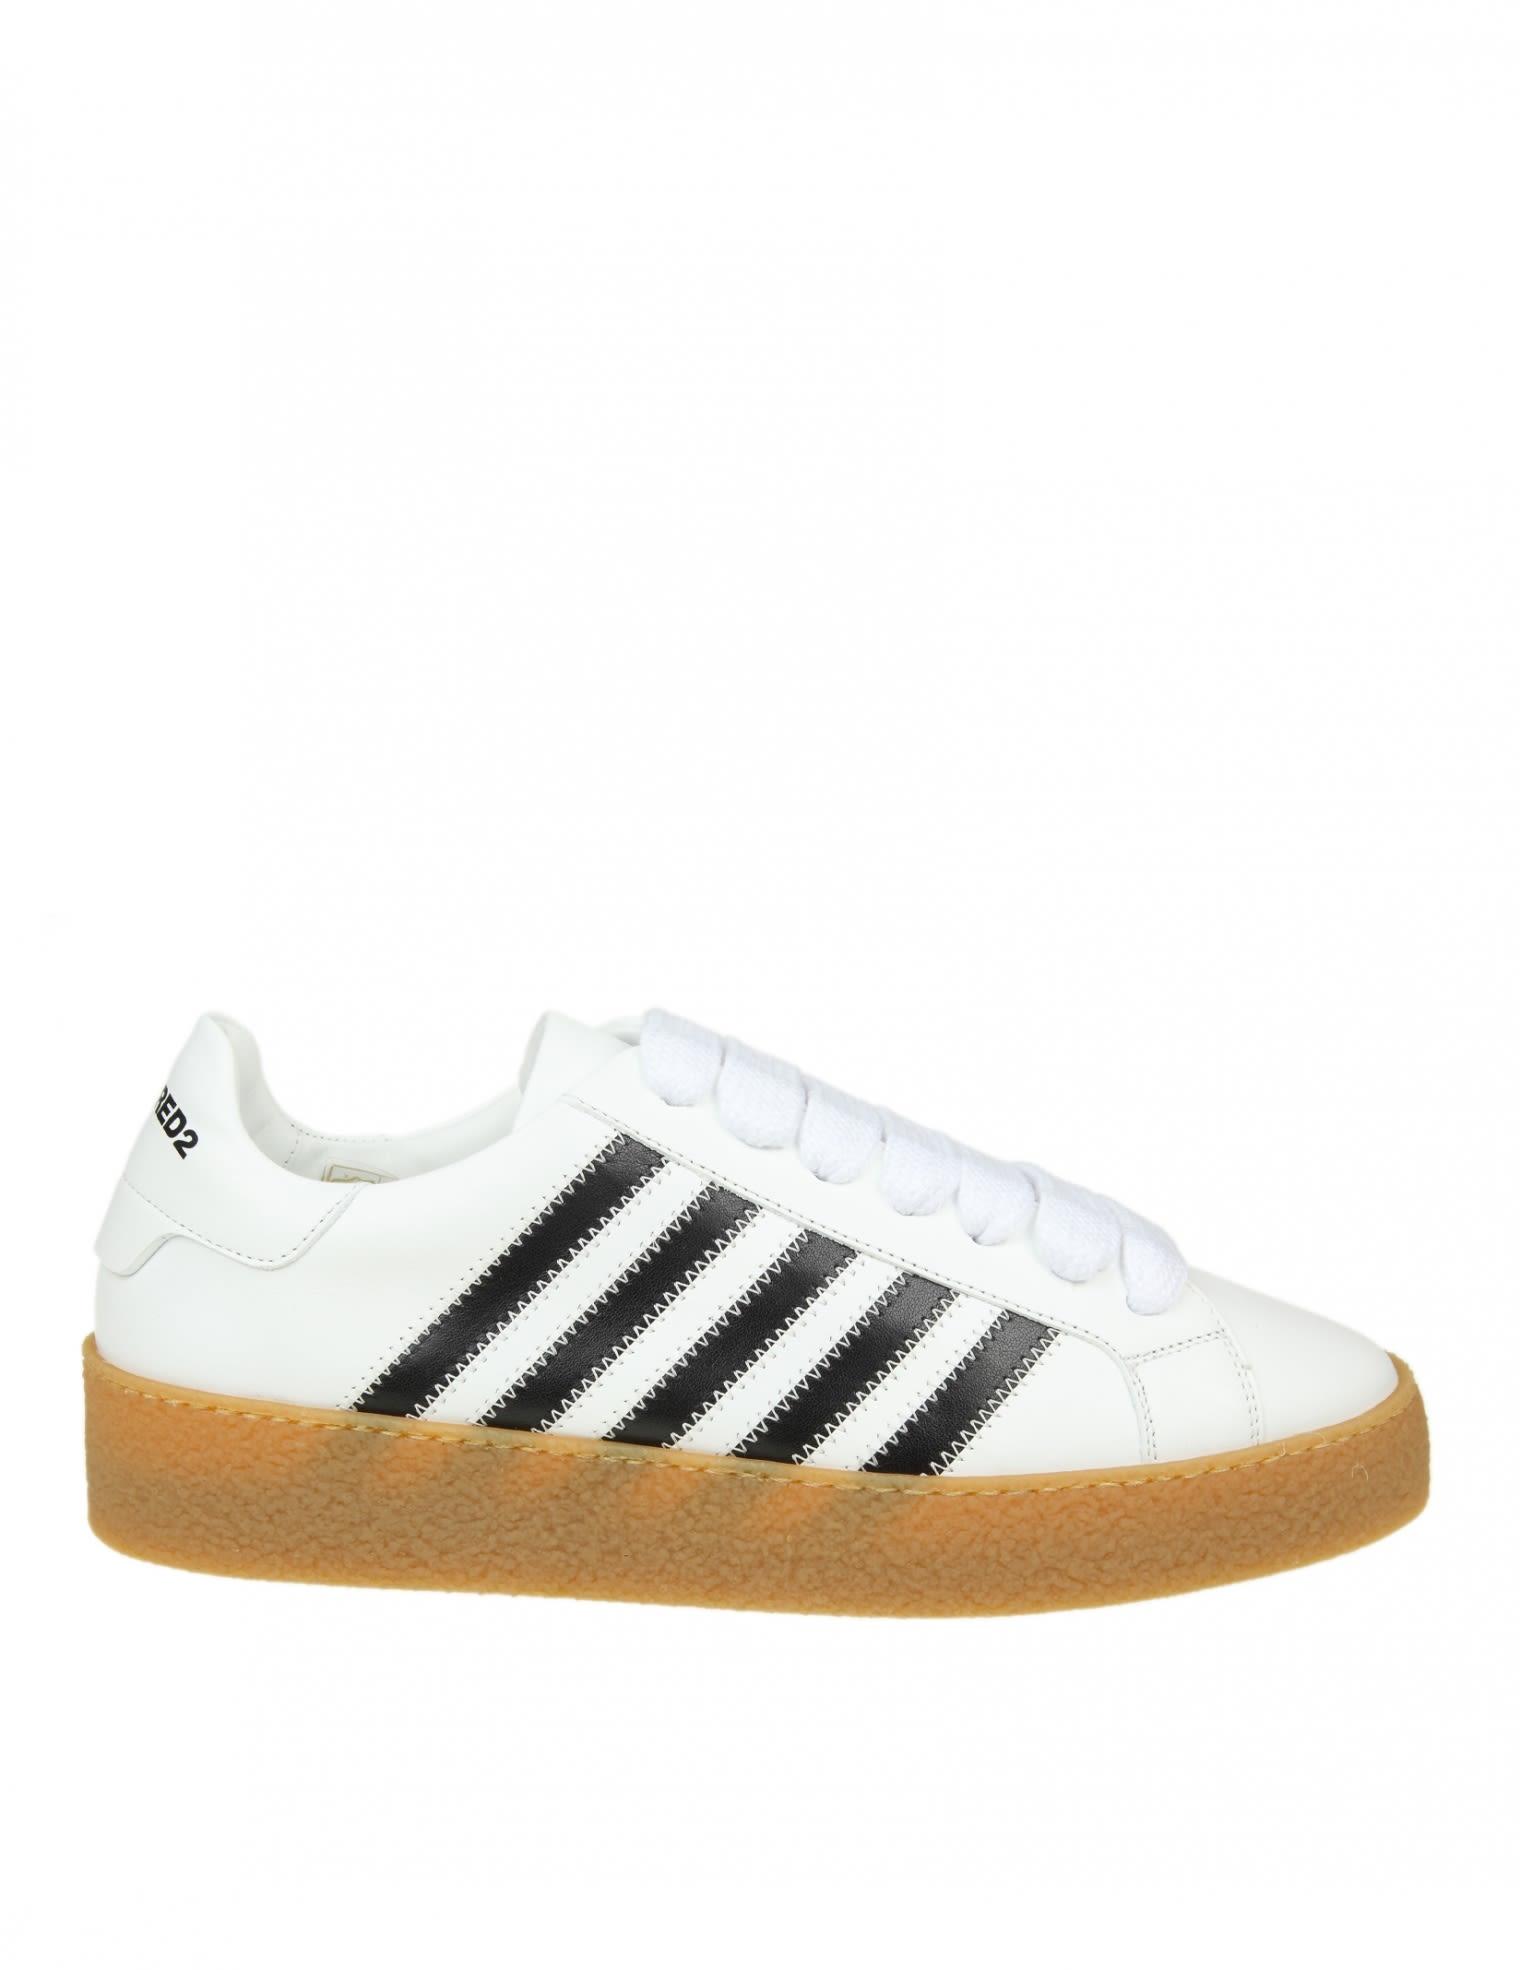 rappers delight sneakers Dsquared2 QKZcQ9gvM